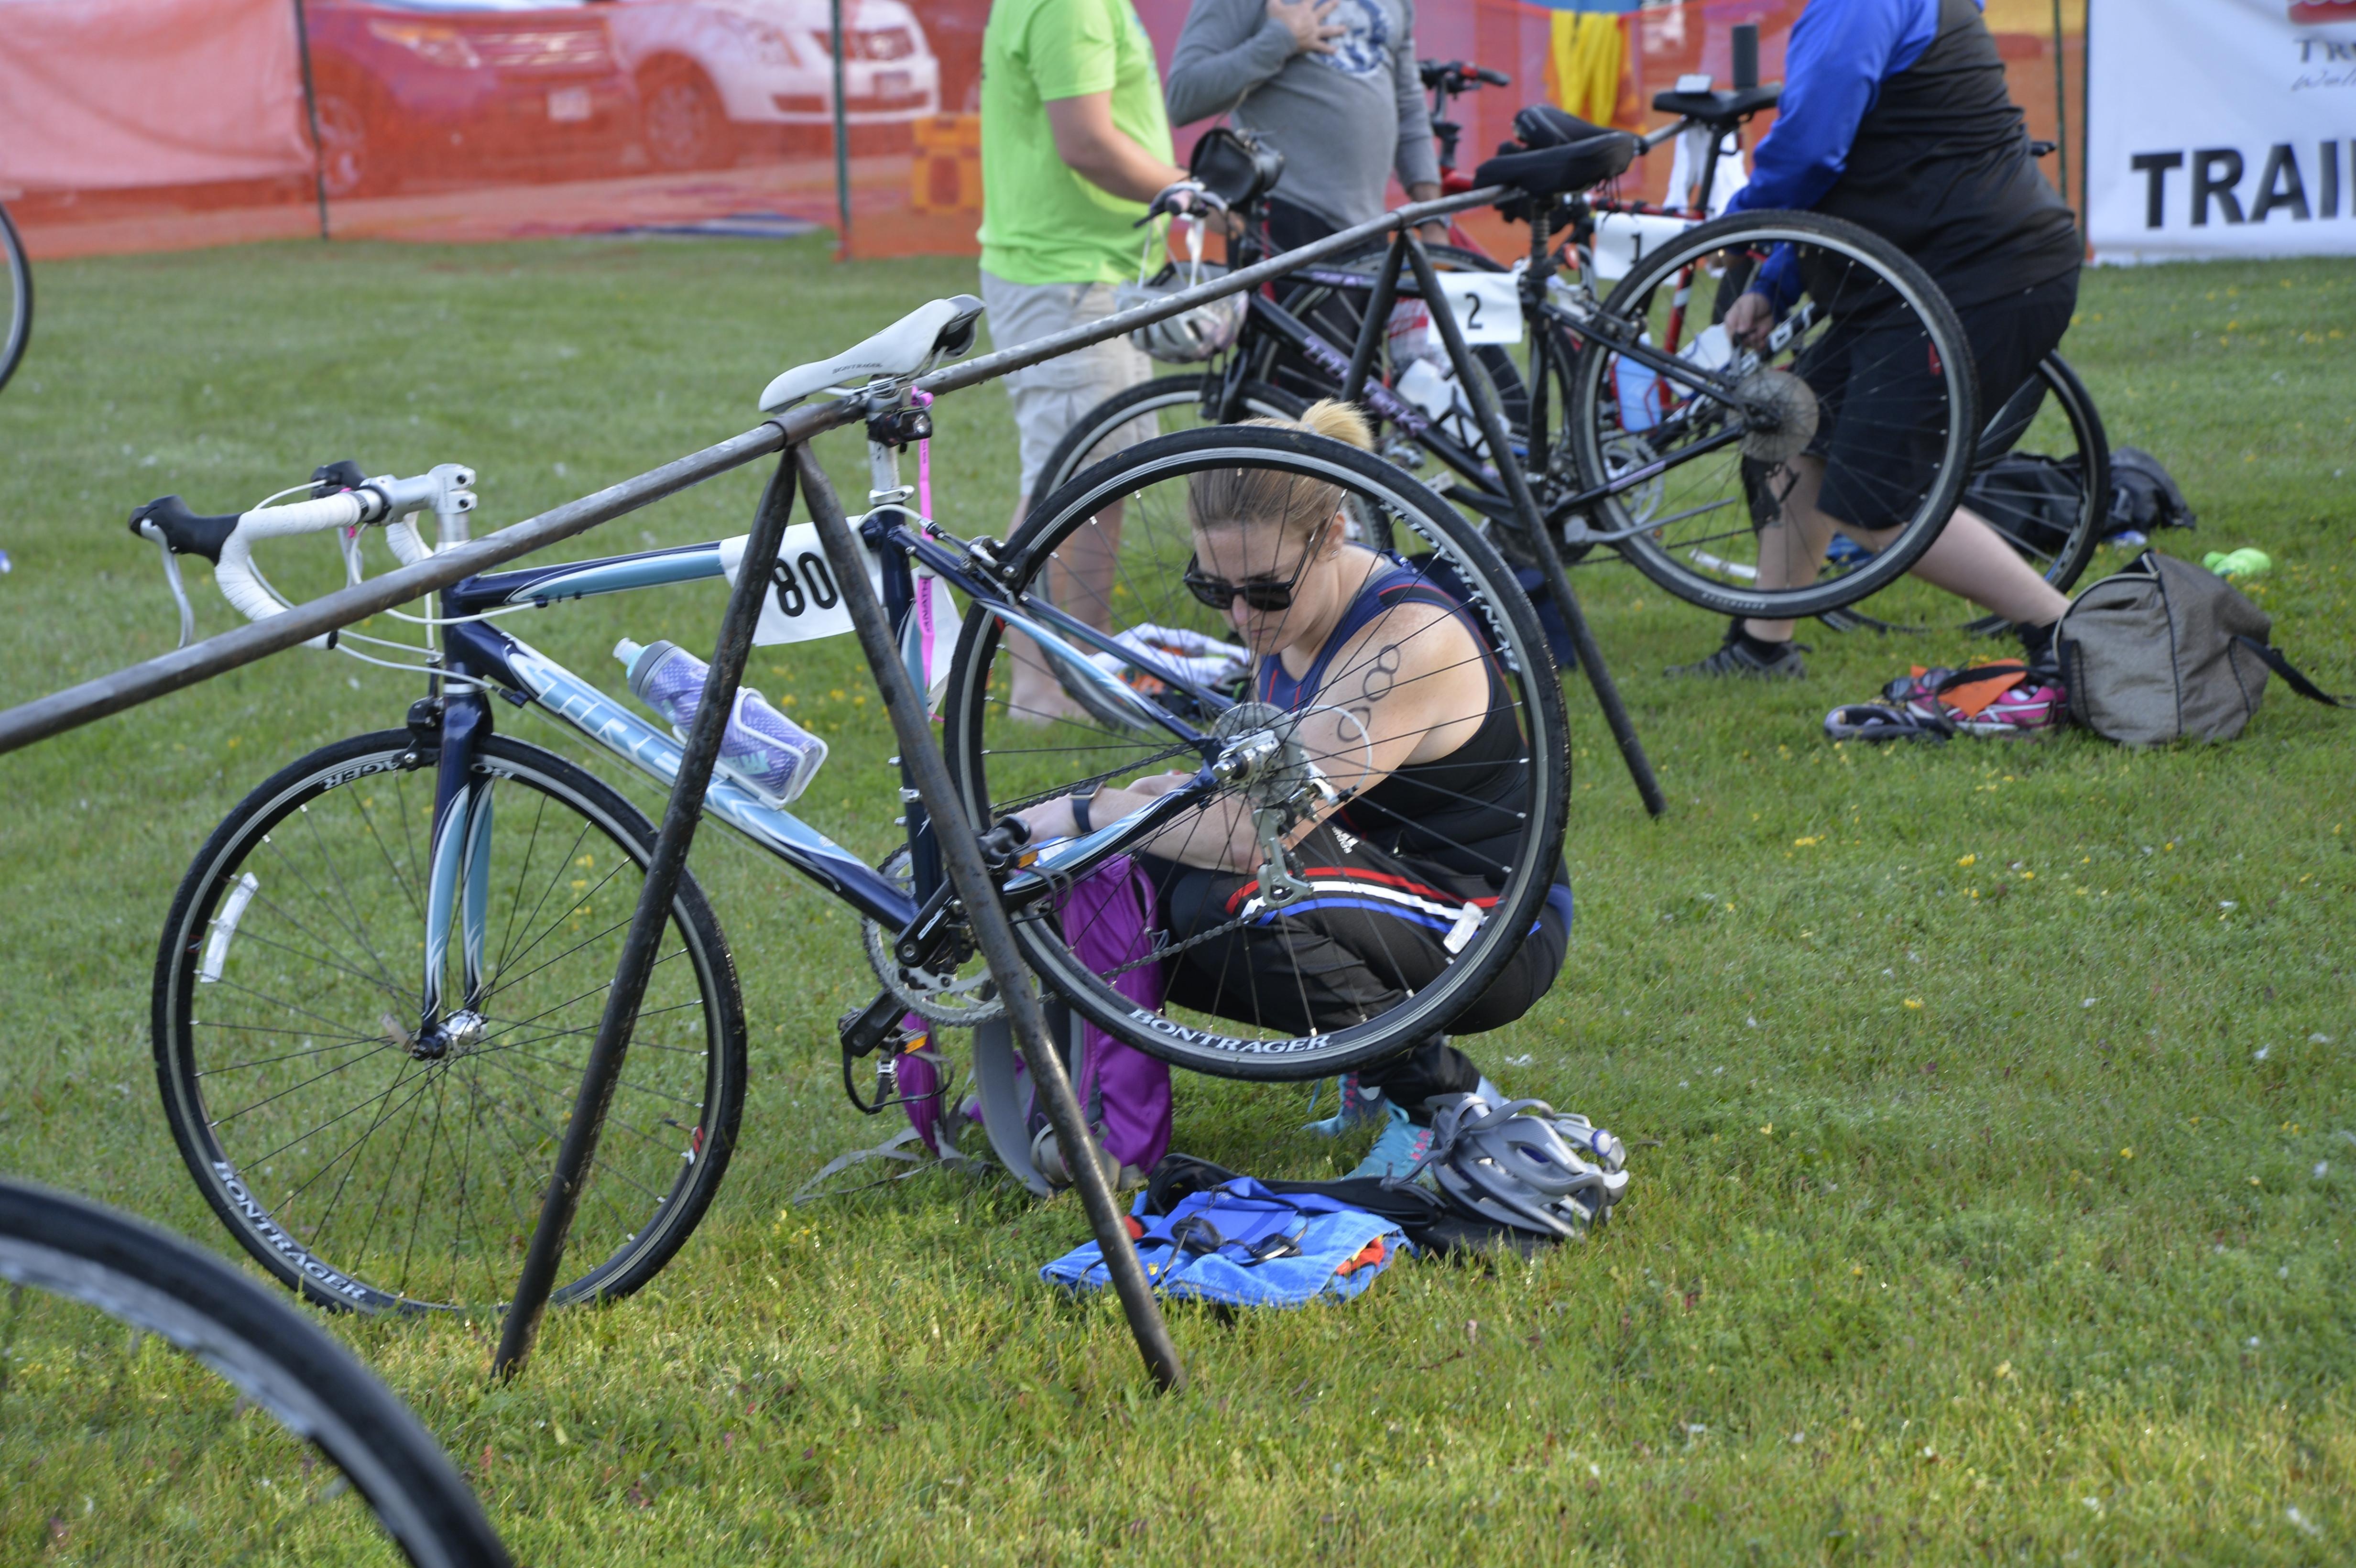 Triathlon Bike Stock Photos & Triathlon Bike Stock Images